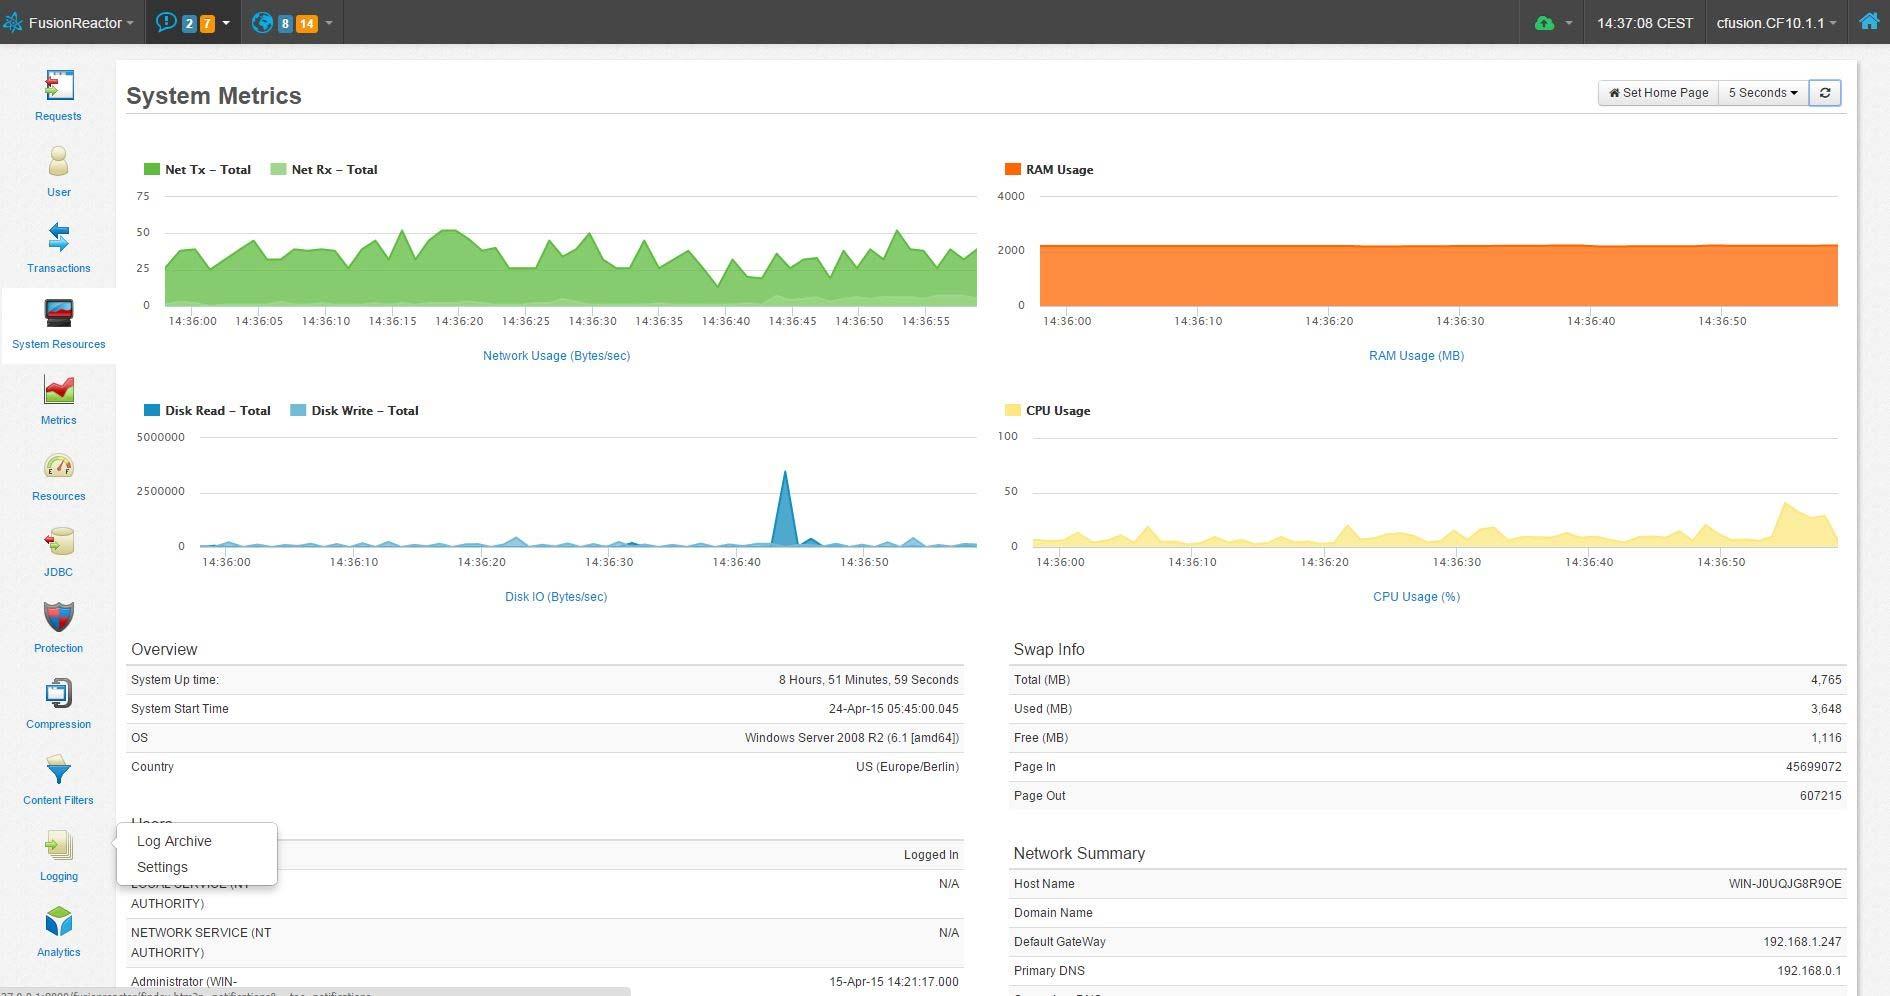 System Monitoring, FusionReactor